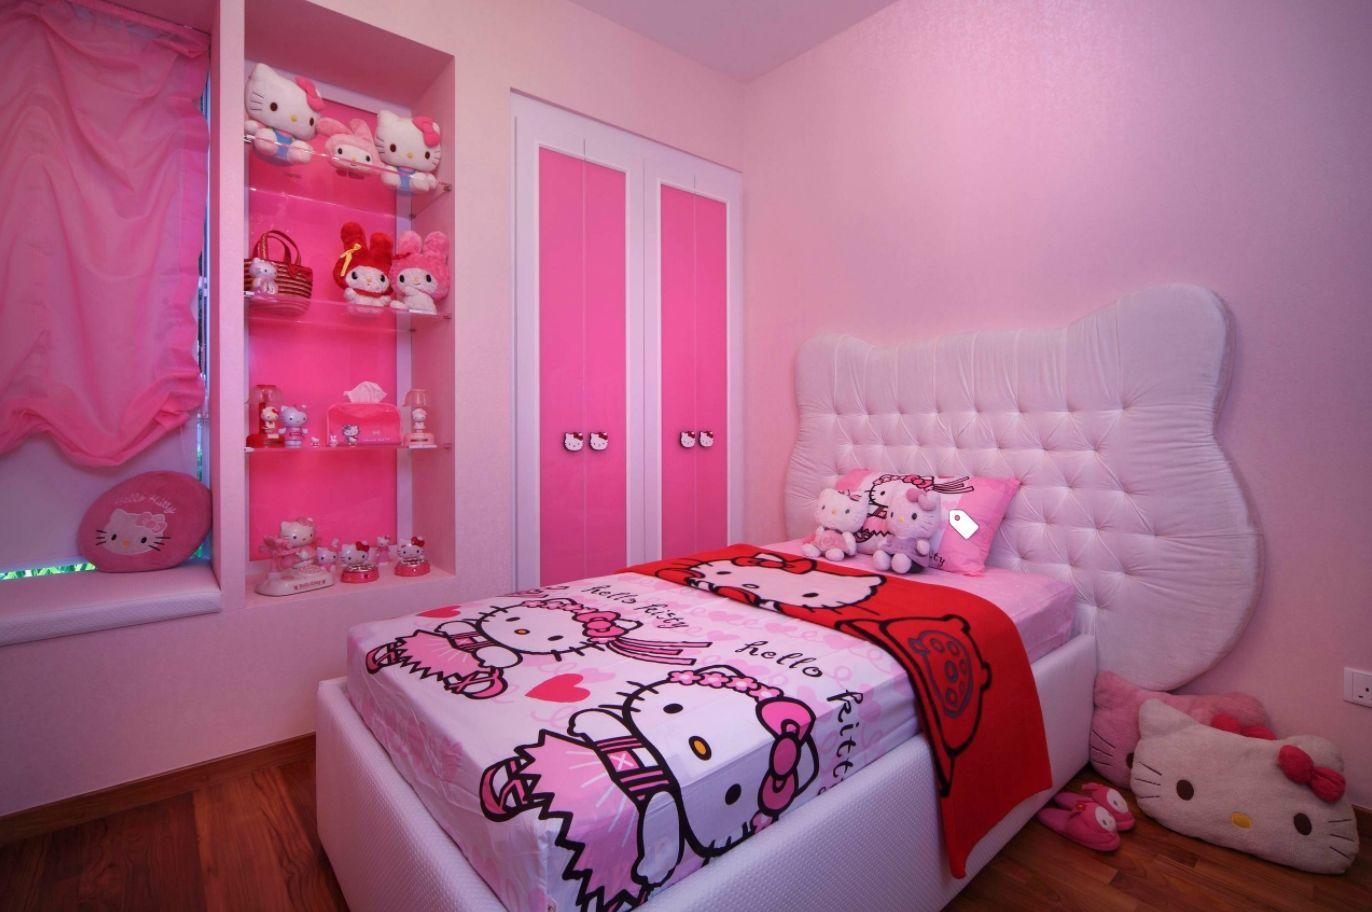 Dekorasi Dinding Kamar Hello Kitty Cek Bahan Bangunan Pernak pernik kamar hello kitty